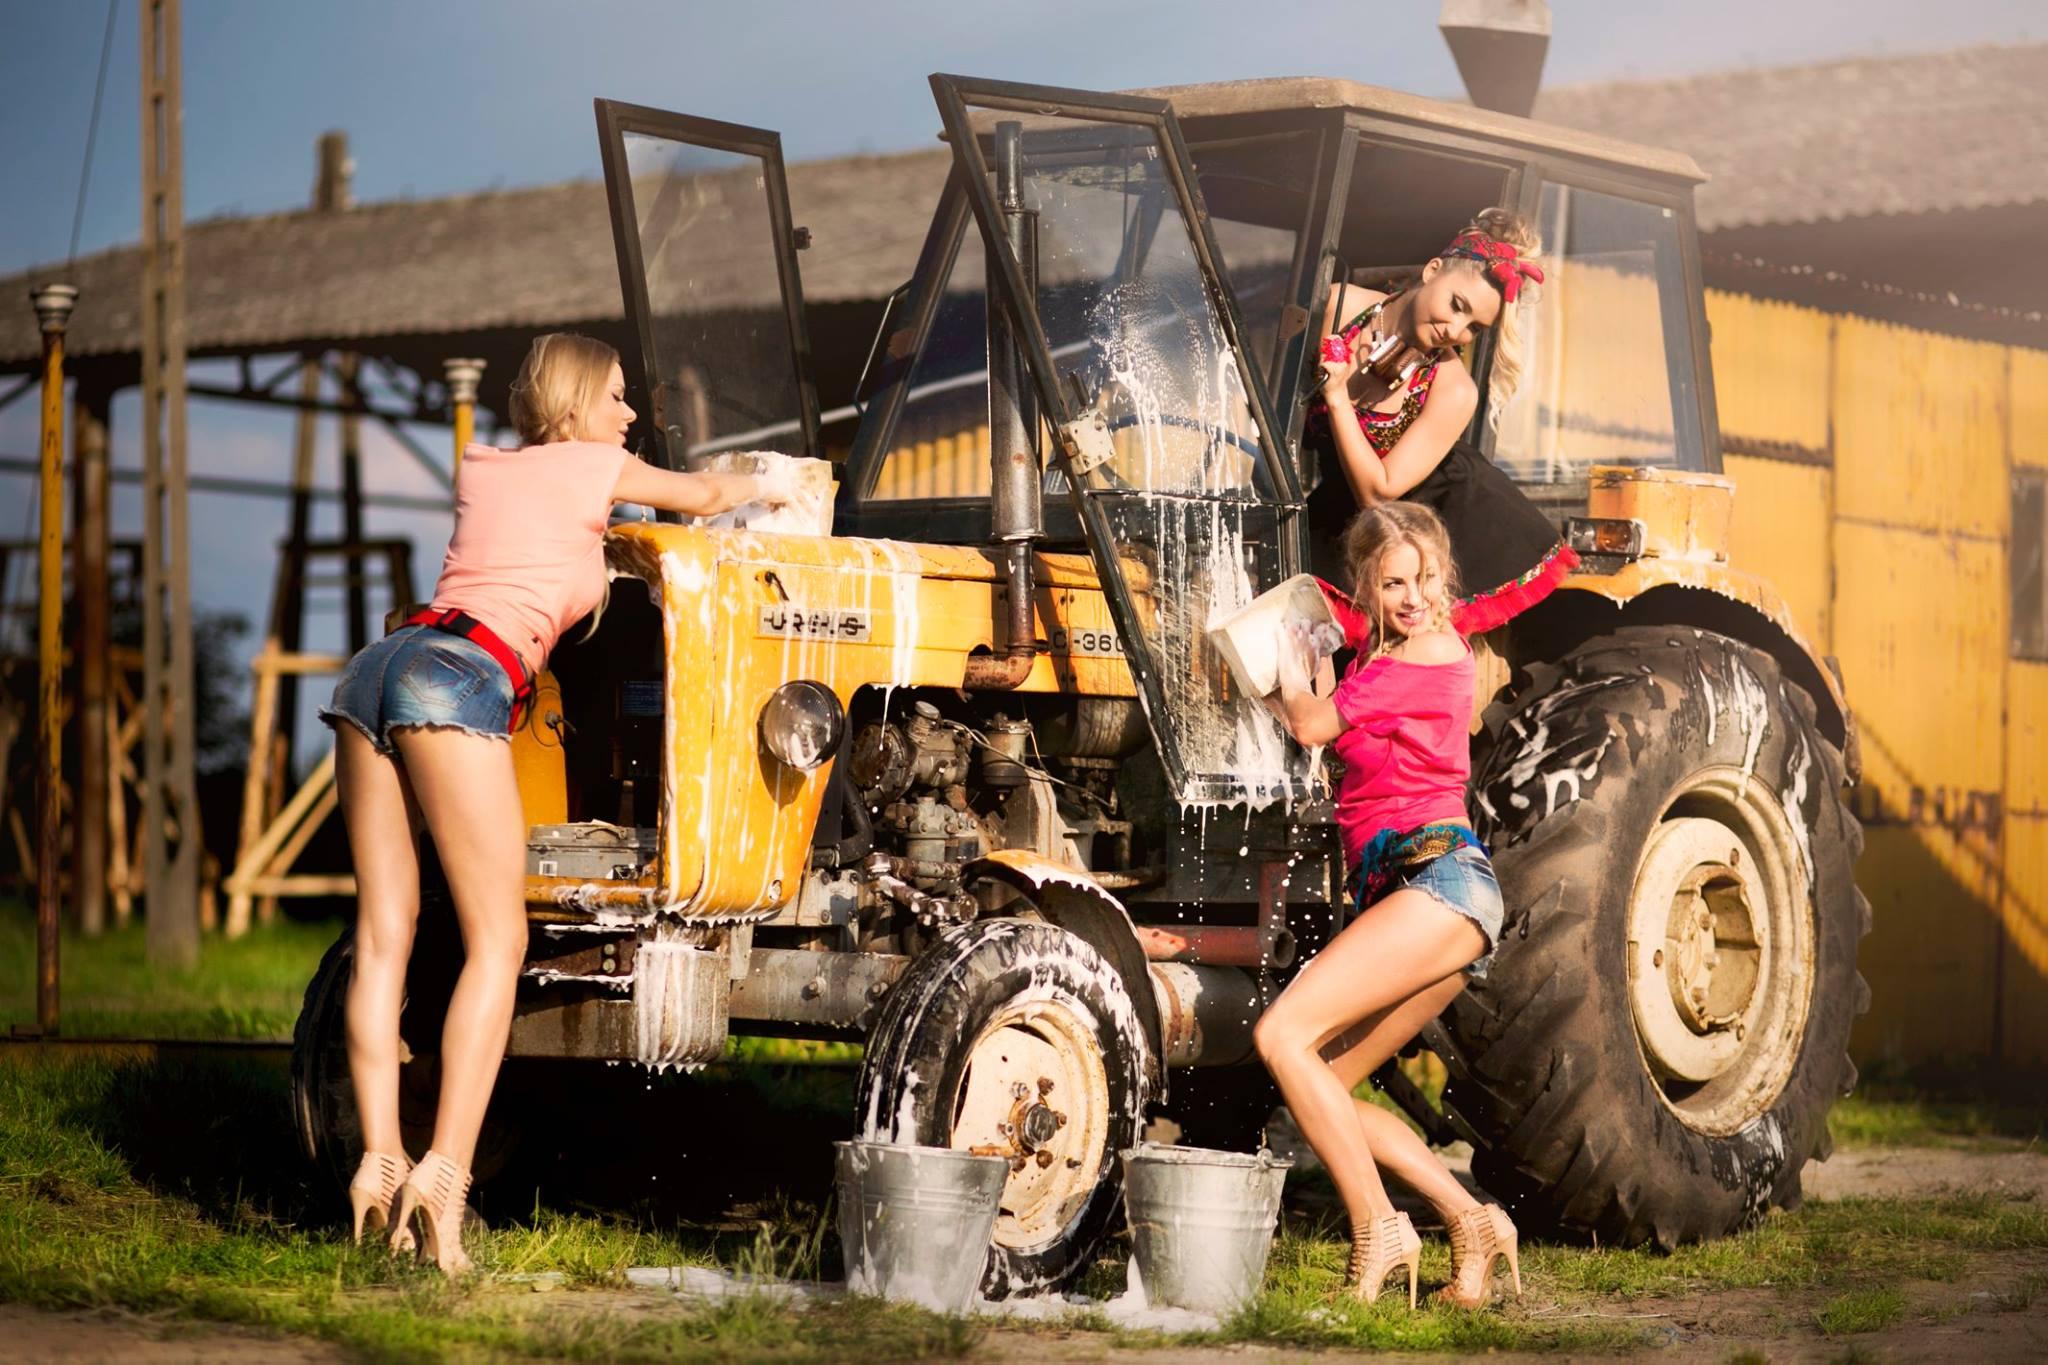 dikiy-seks-na-prirode-v-traktori-seks-video-trahni